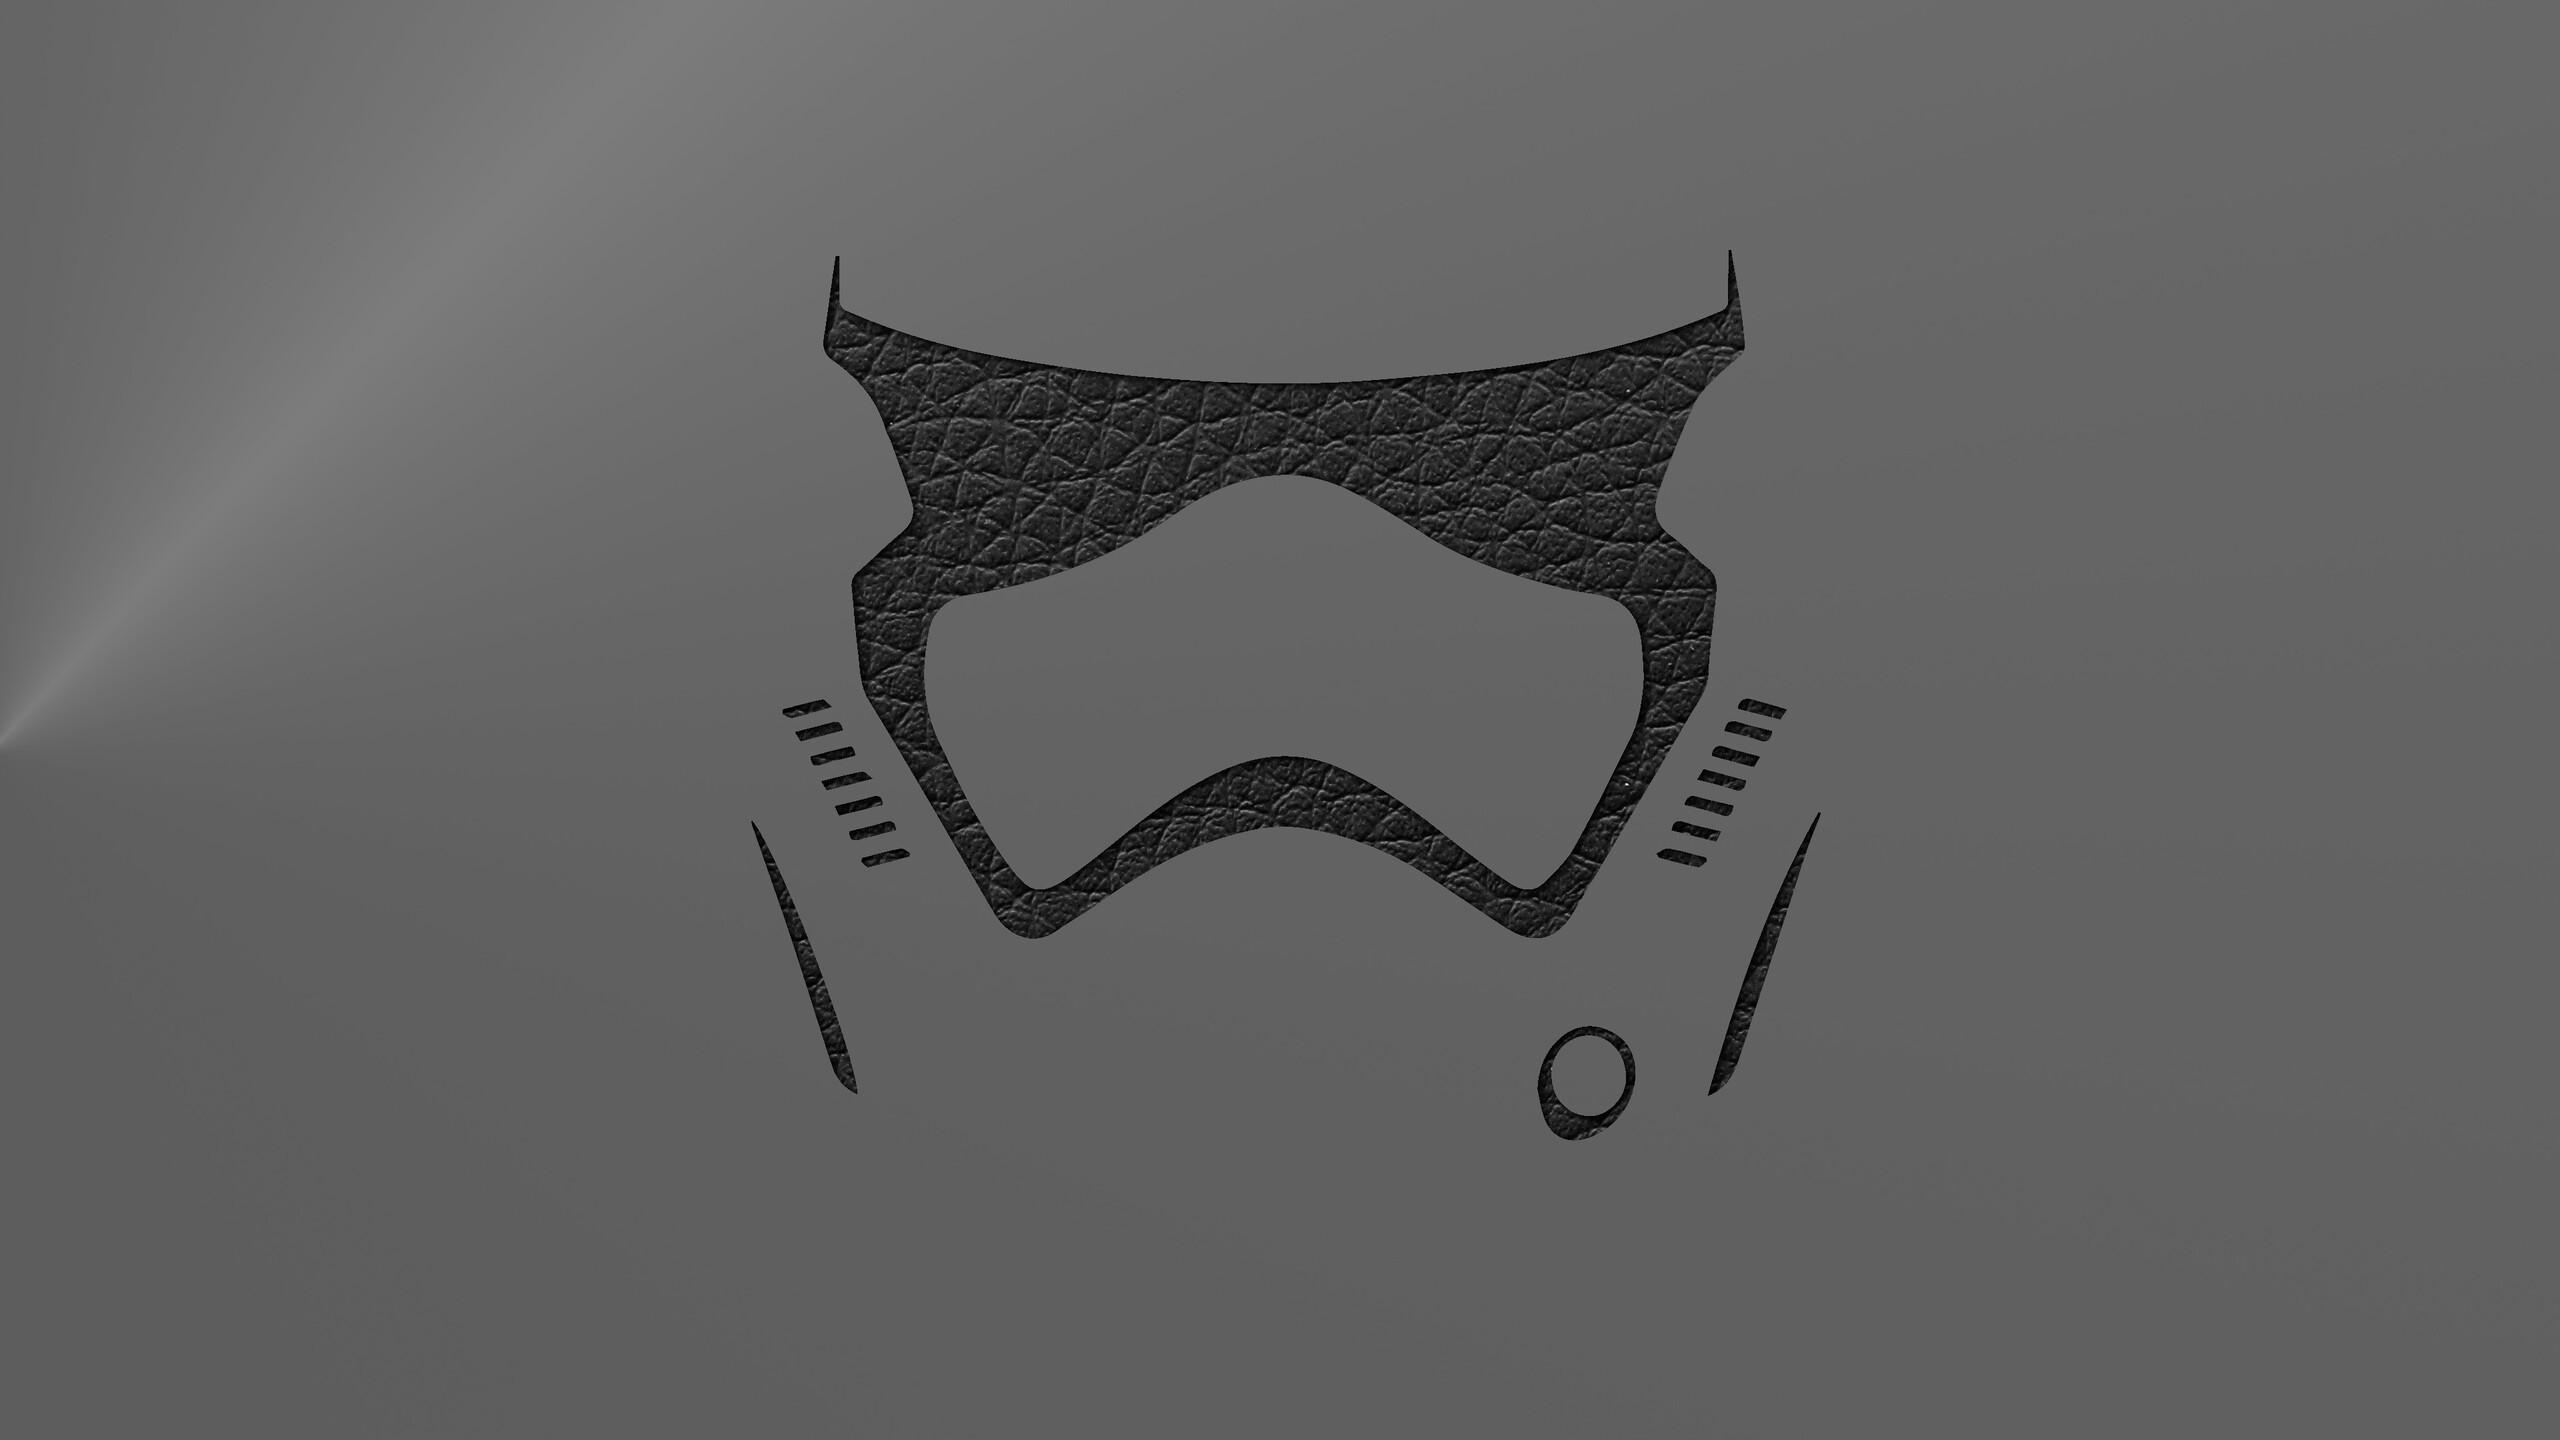 2560x1440 Stormtrooper Leather Minimalism 1440P Resolution ...